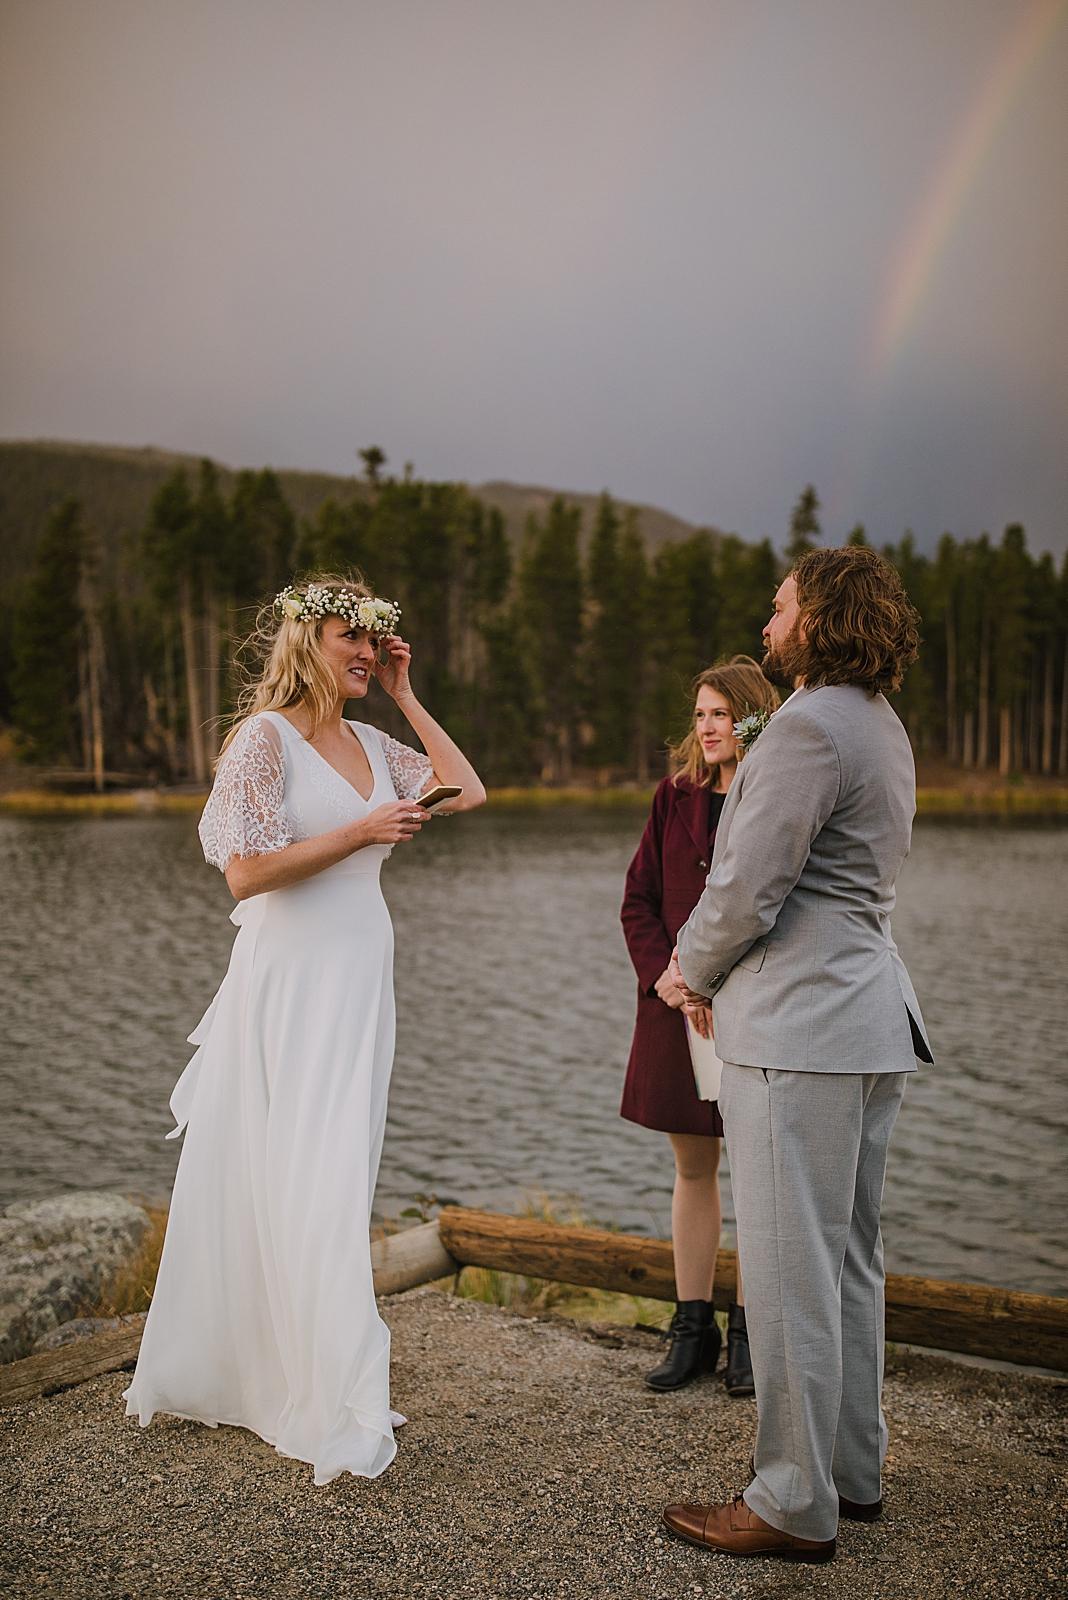 sprague lake dock elopement, sunrise elopement, colorado elopement, sprague lake elopement, rainbow on wedding day, rocky mountain national park elopement, adventurous colorado hiking elopement